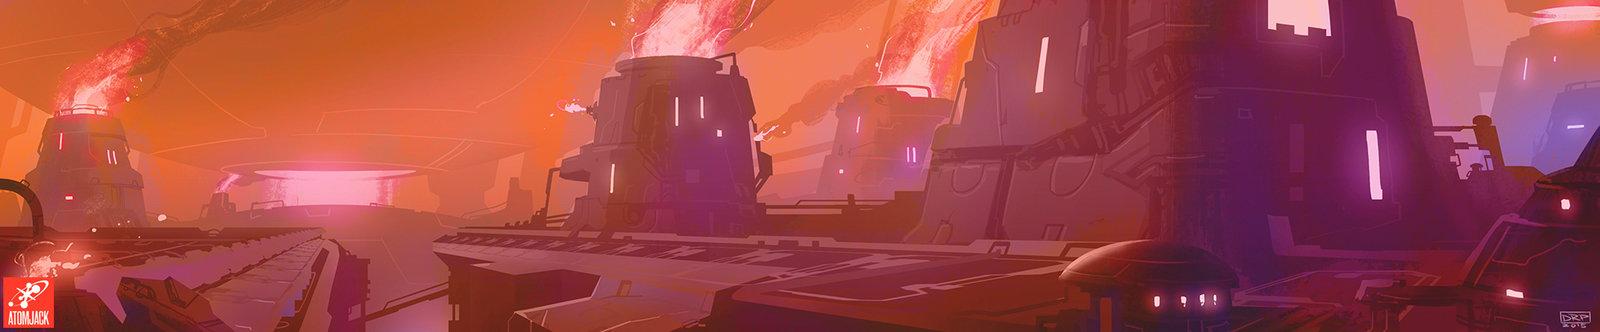 Incinerator Zone